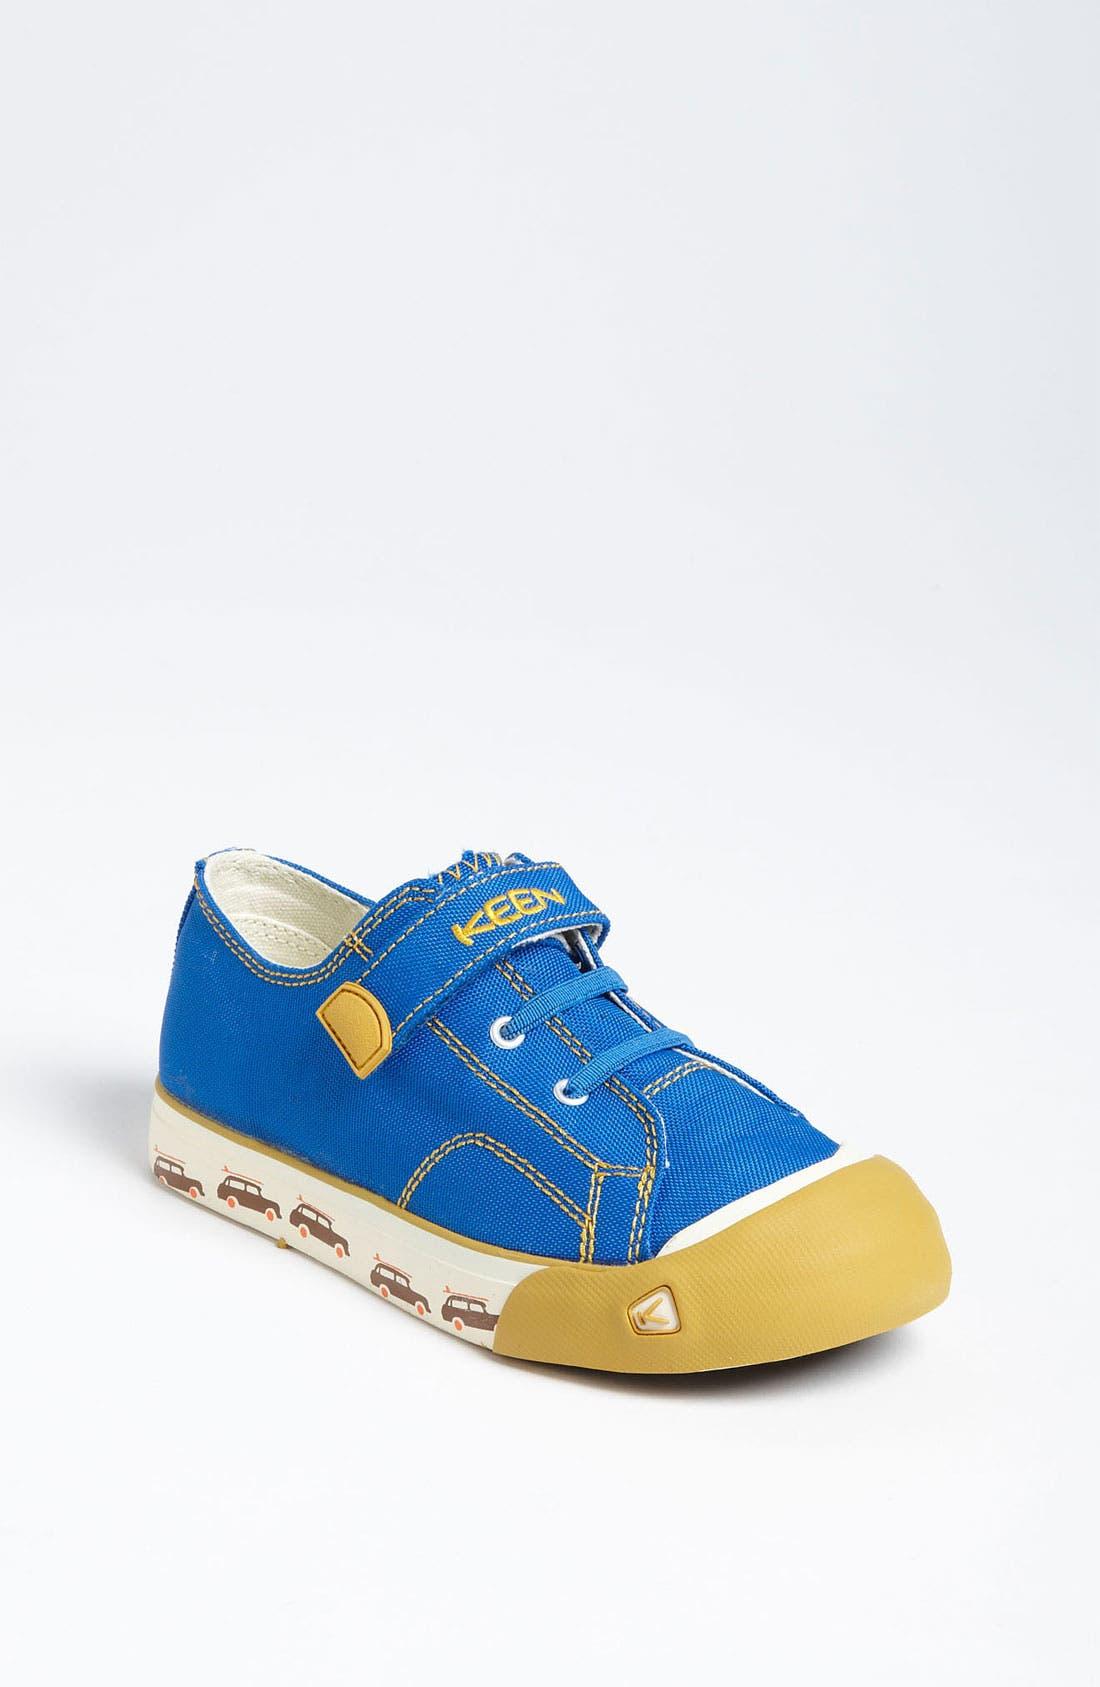 Alternate Image 1 Selected - Keen 'Coronado' Sneaker (Baby, Walker, Toddler & Little Kid)